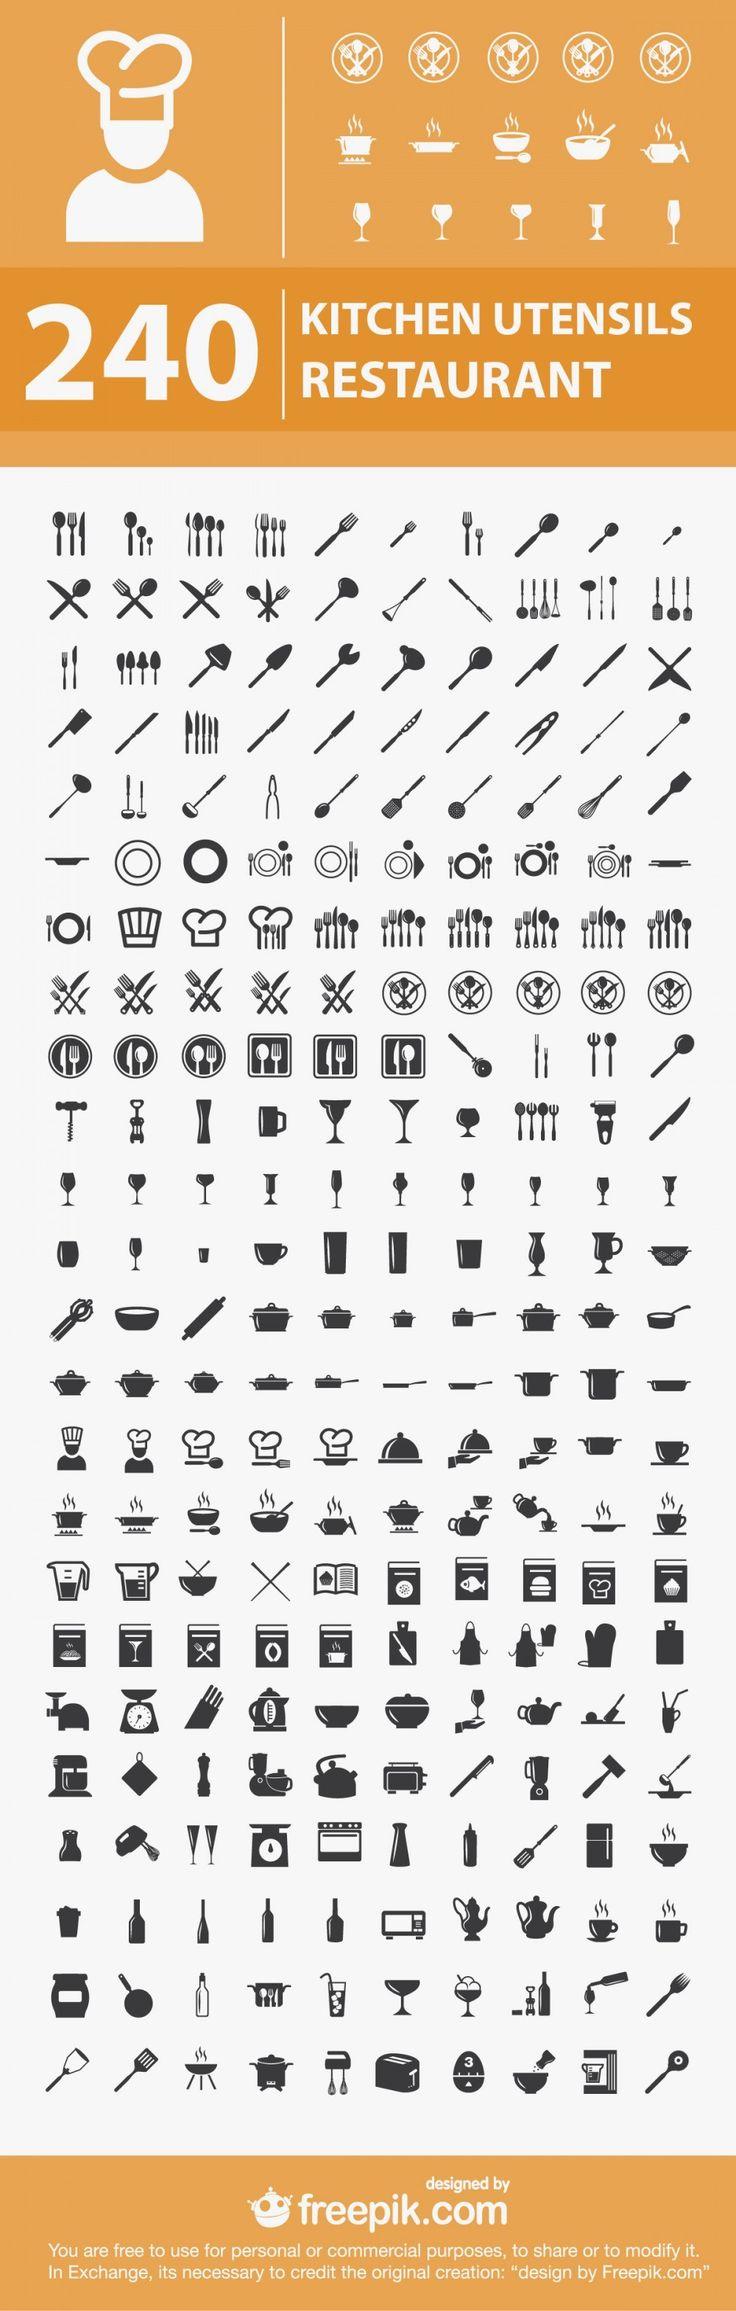 240 Free Kitchen / Restaurant Icons,